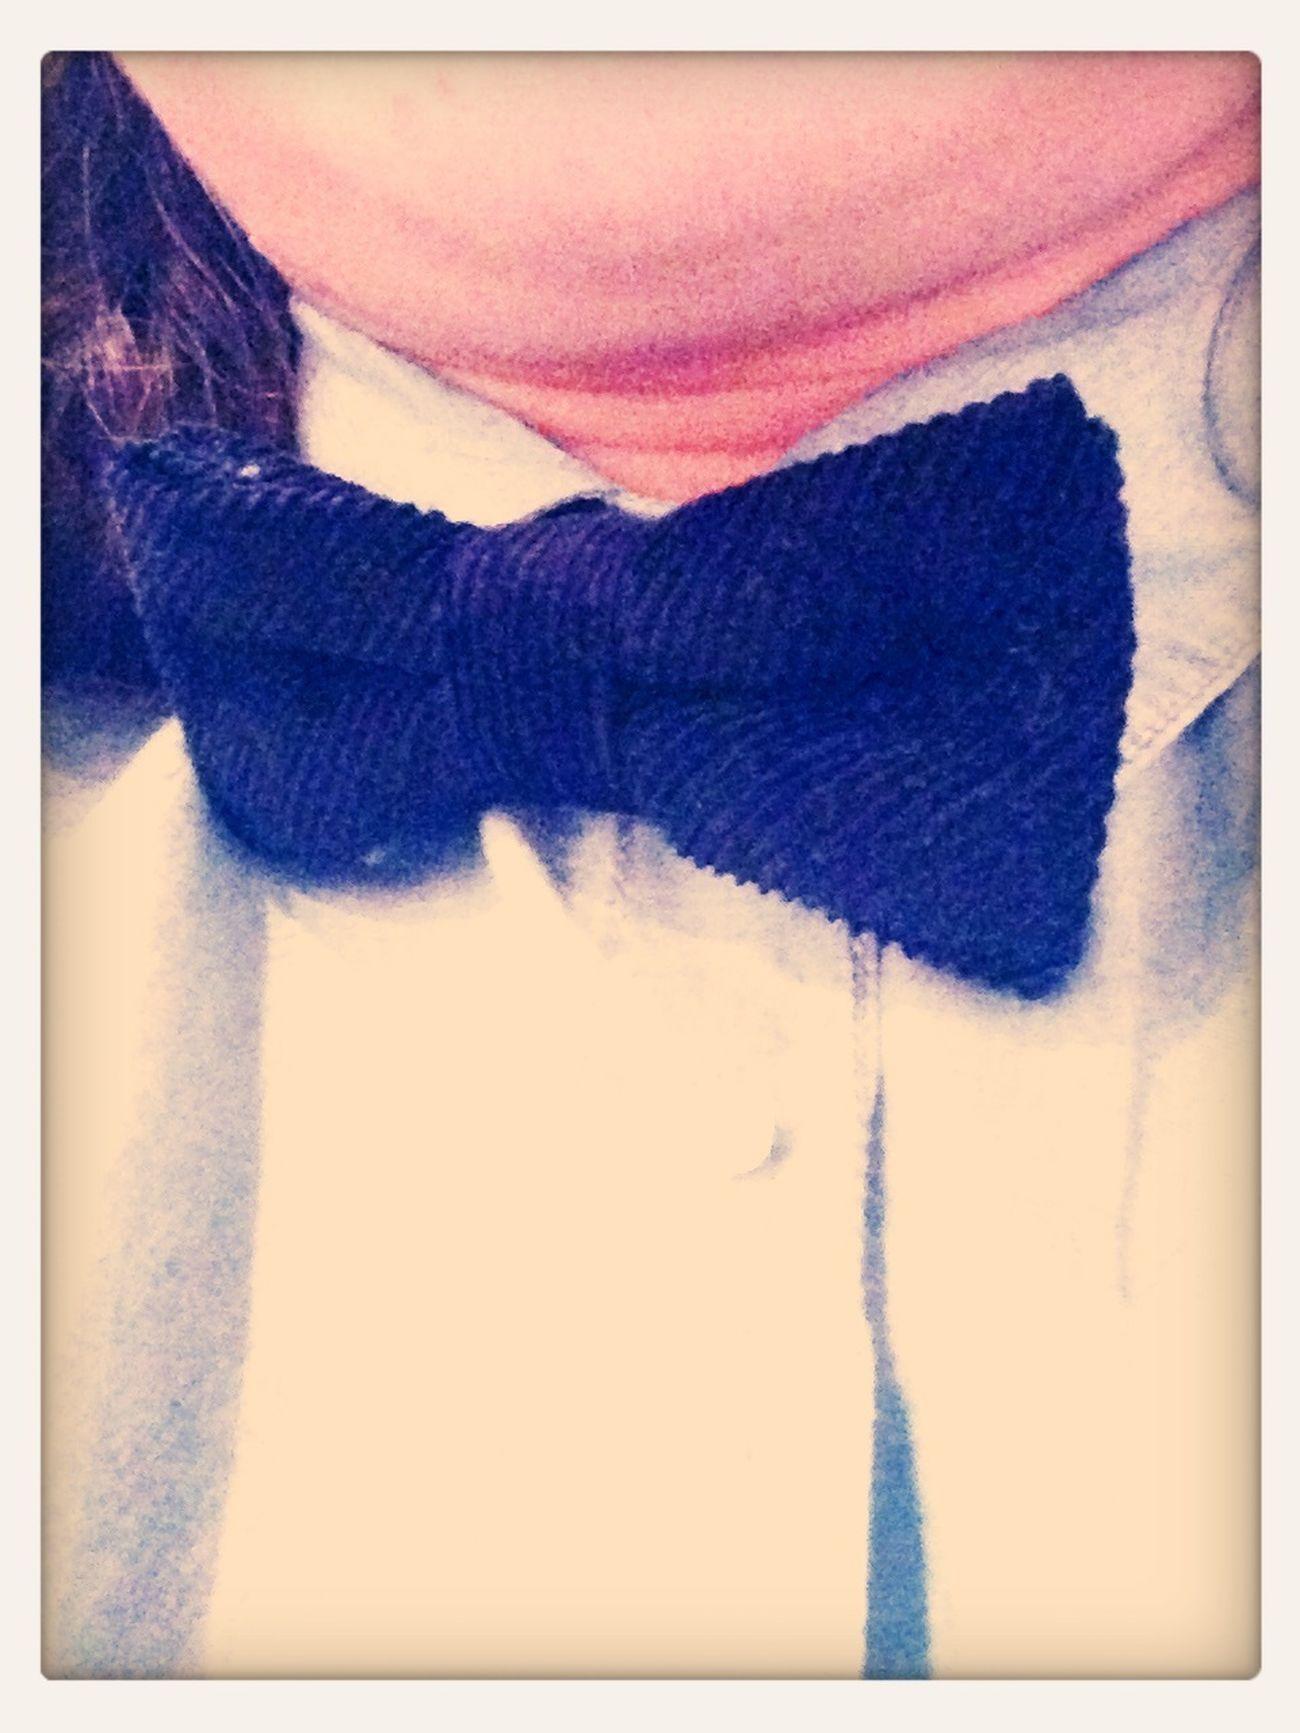 Bow Tie!